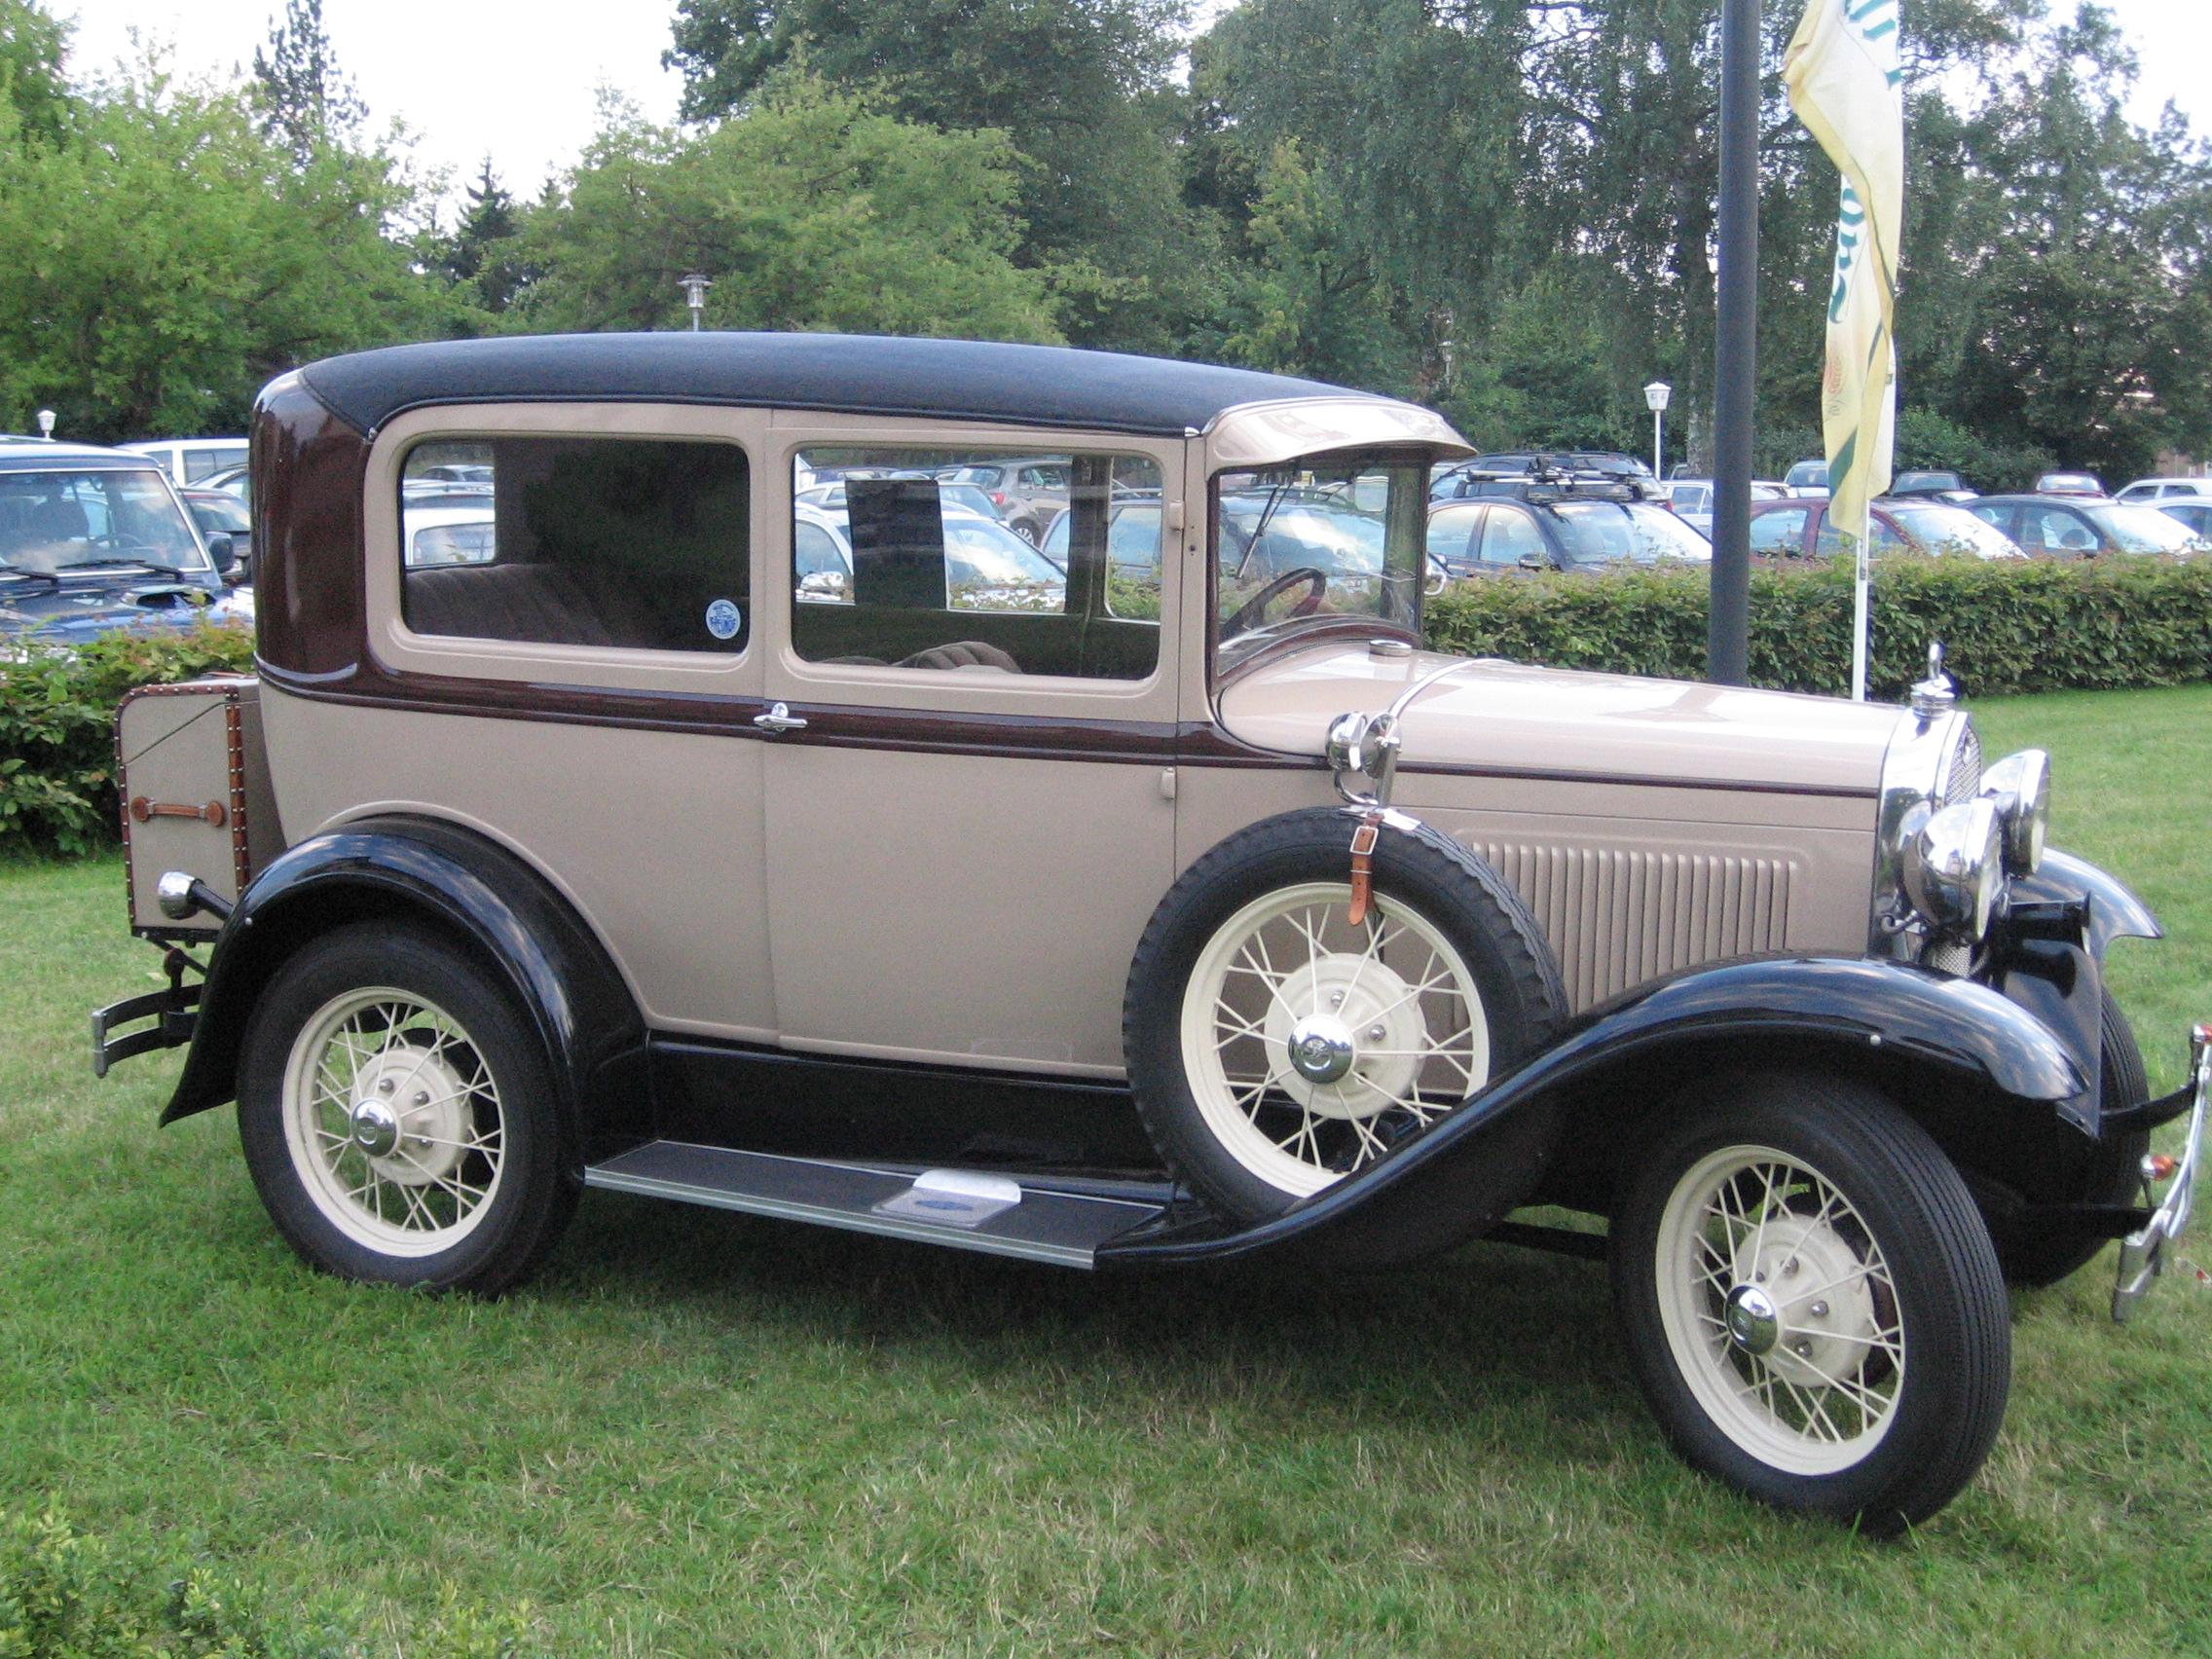 HQ 1930 Ford Sedan Wallpapers | File 1466.85Kb